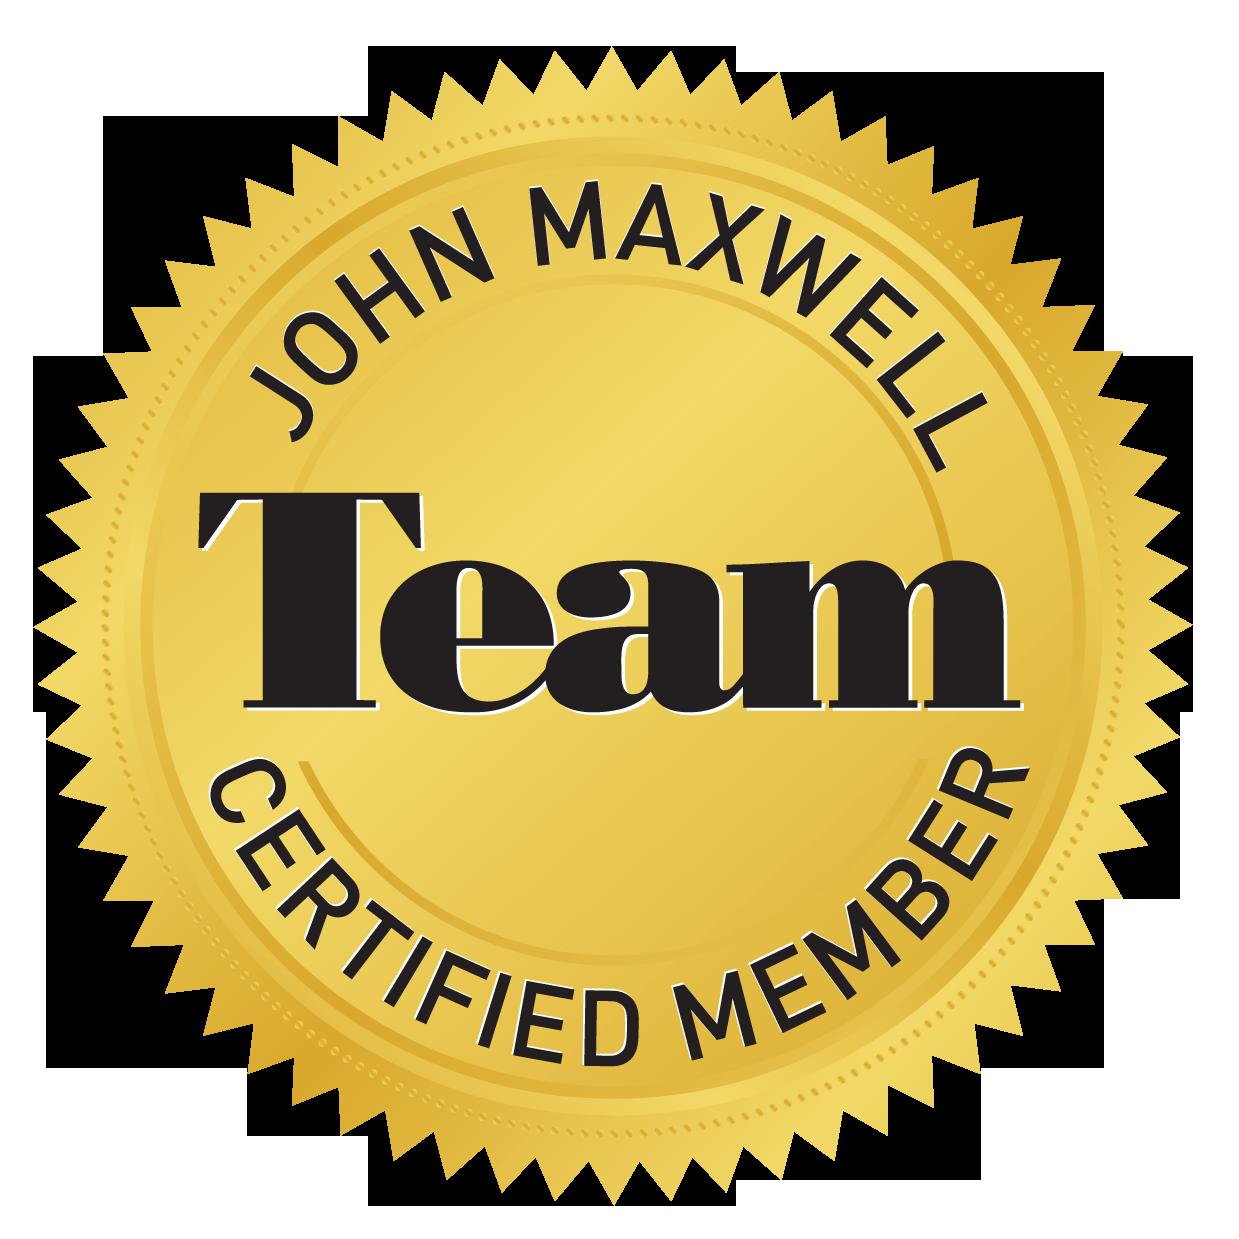 John Maxwell Certification logo